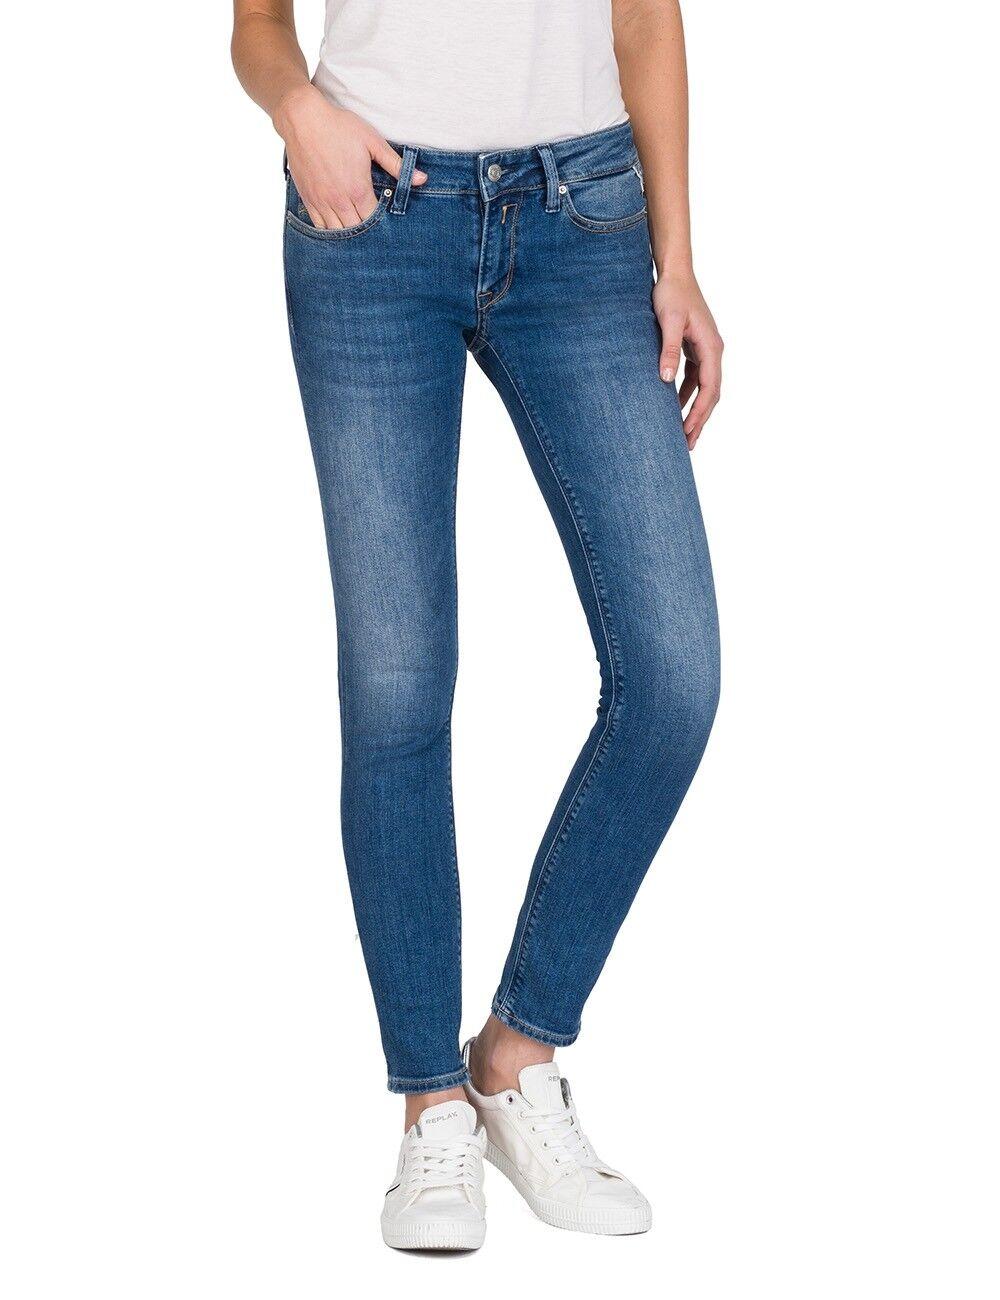 Replay Damen Jeans Luz - Skinny Fit - Blau - Medium Light